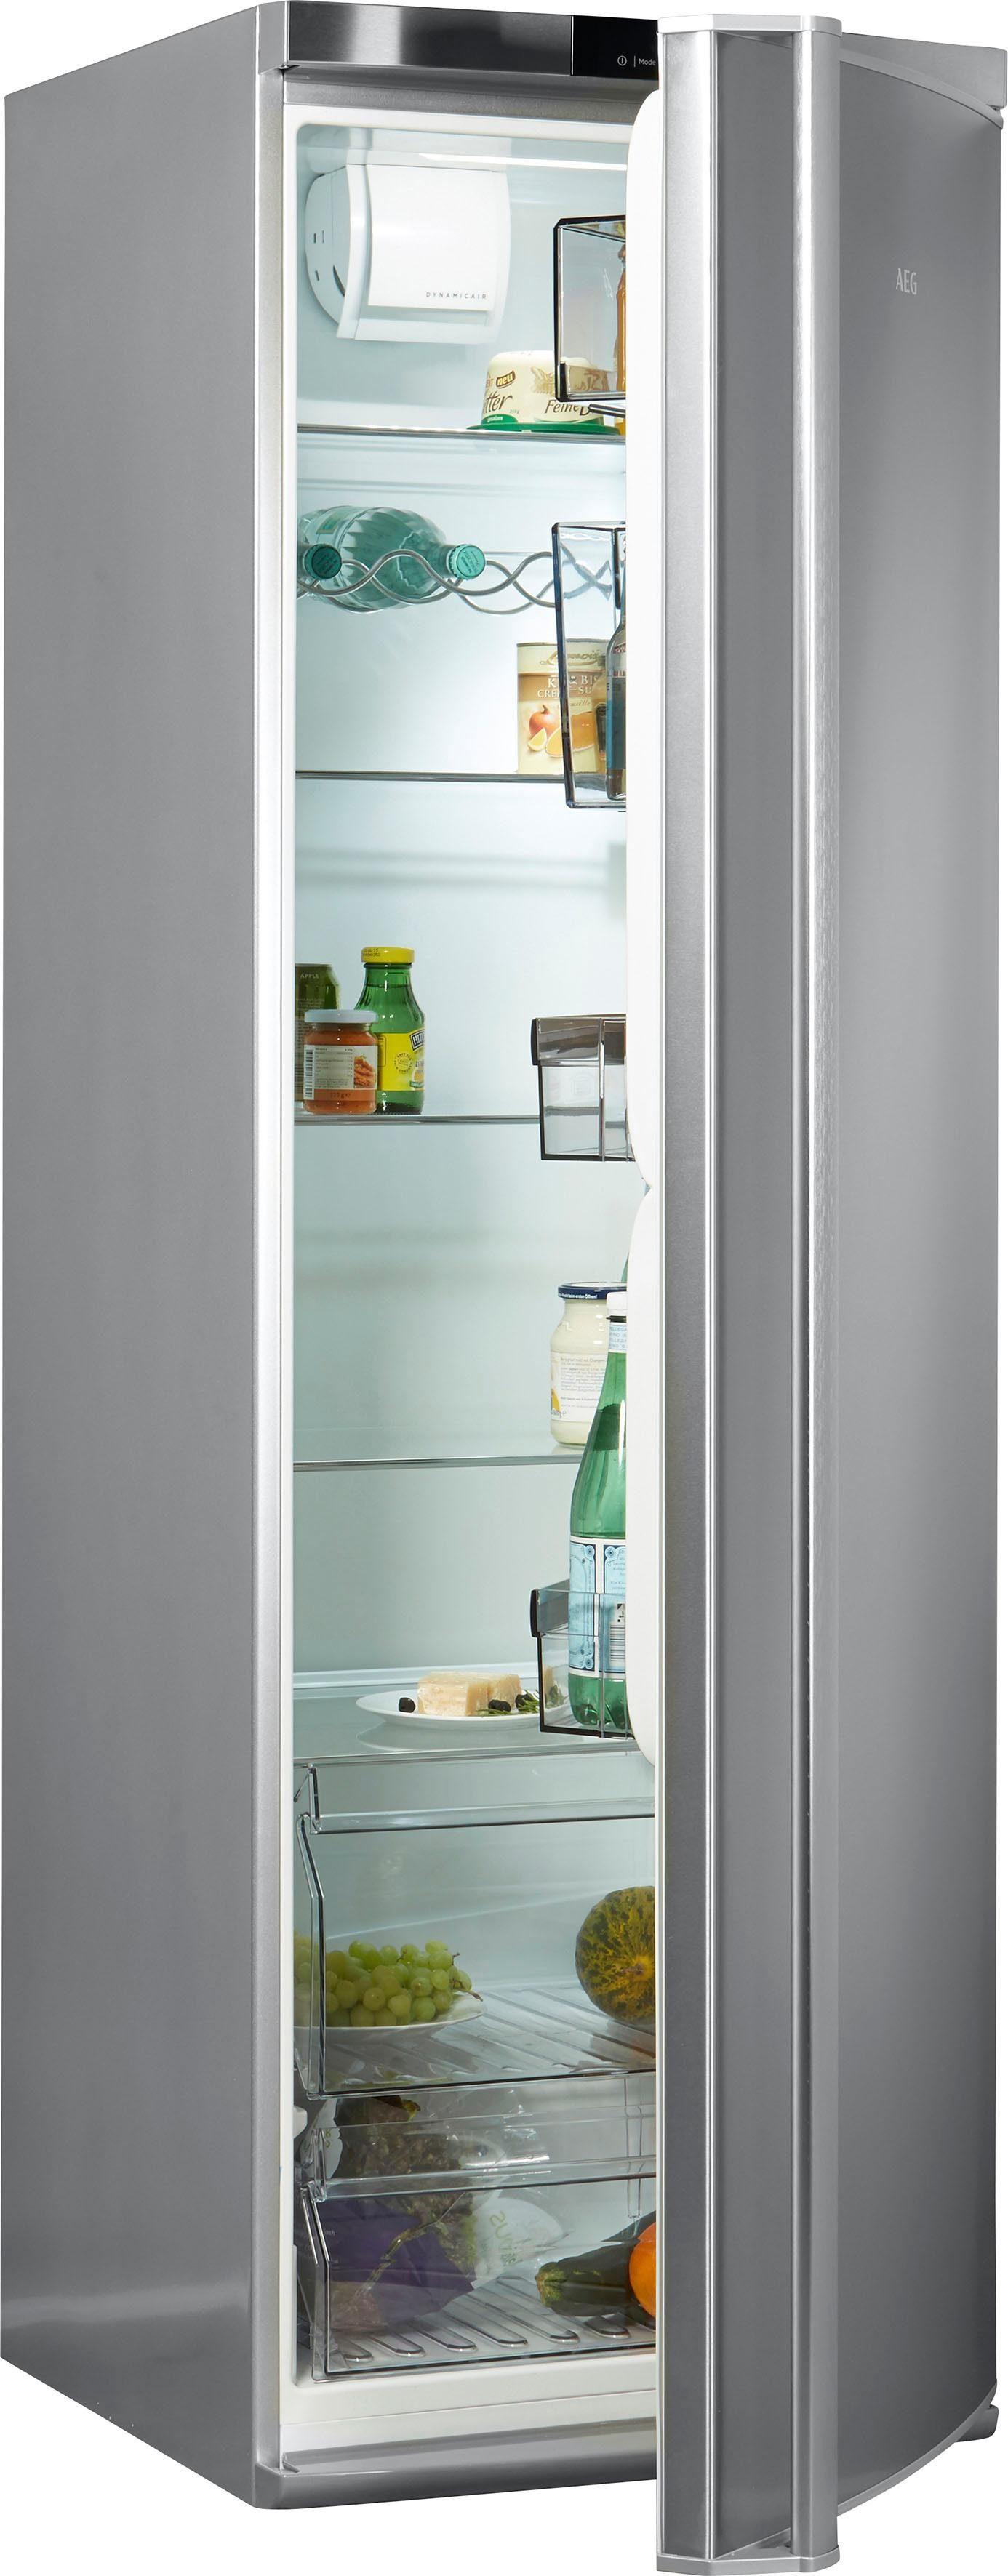 AEG Kühlschrank RKB64024DX, 185 cm hoch, 59,5 cm breit